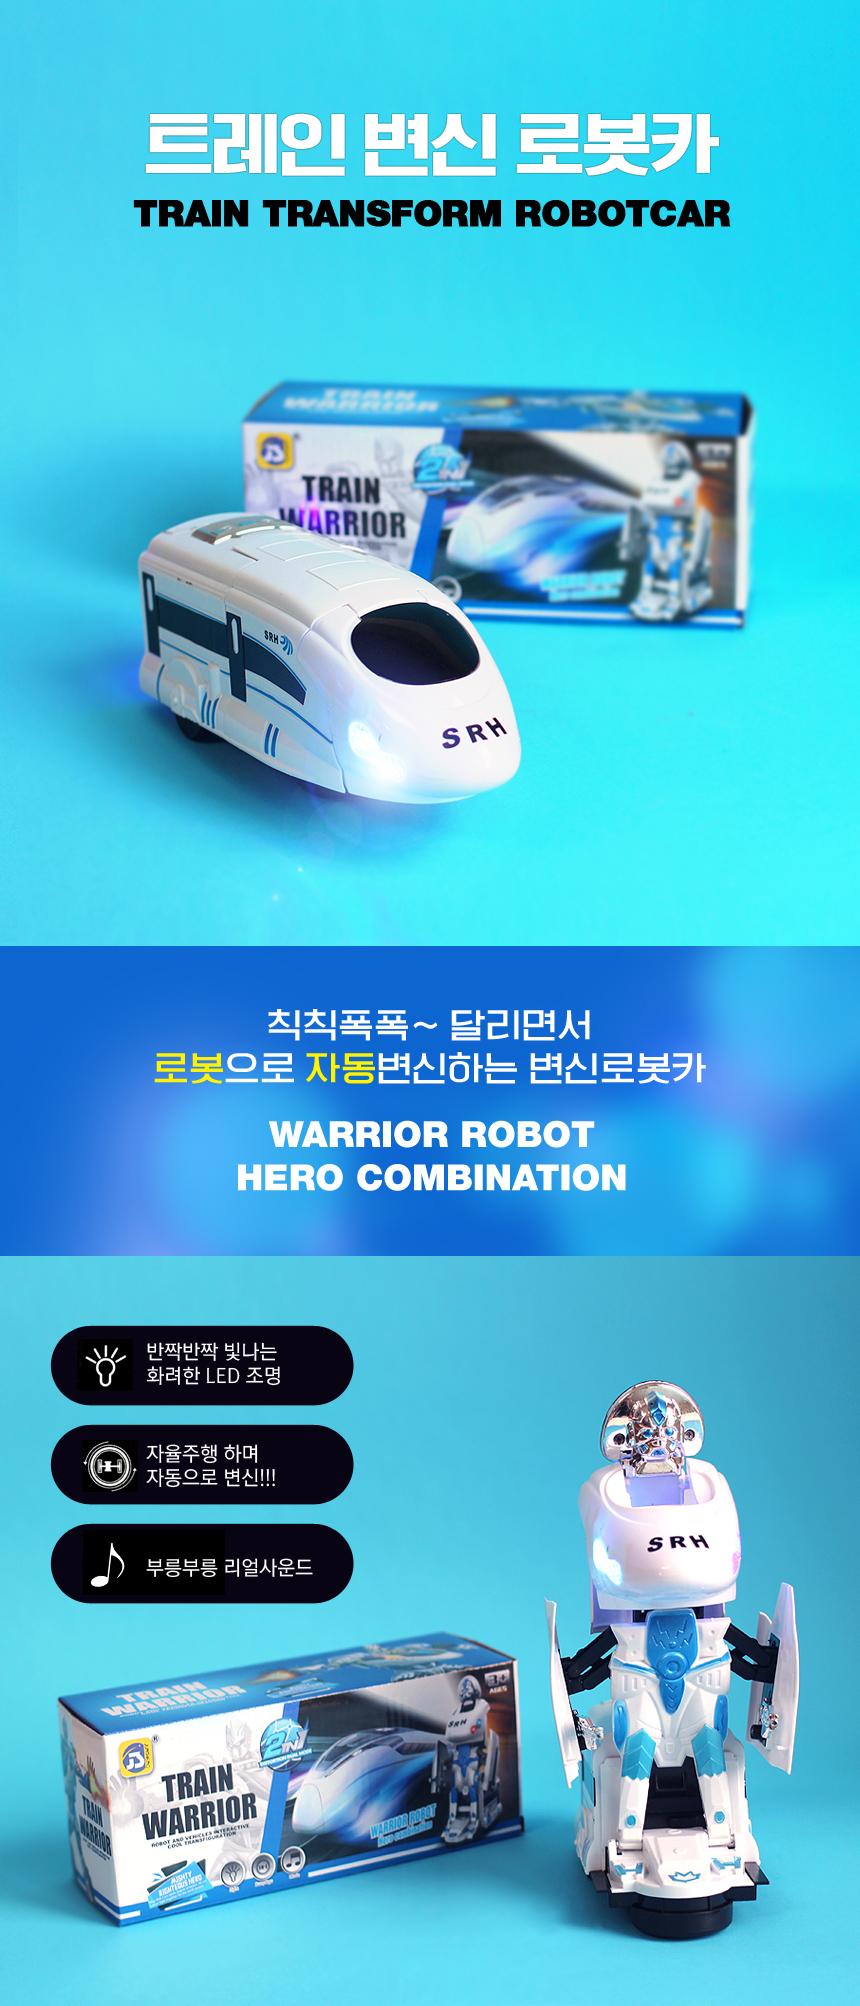 train_robotcar_01.jpg